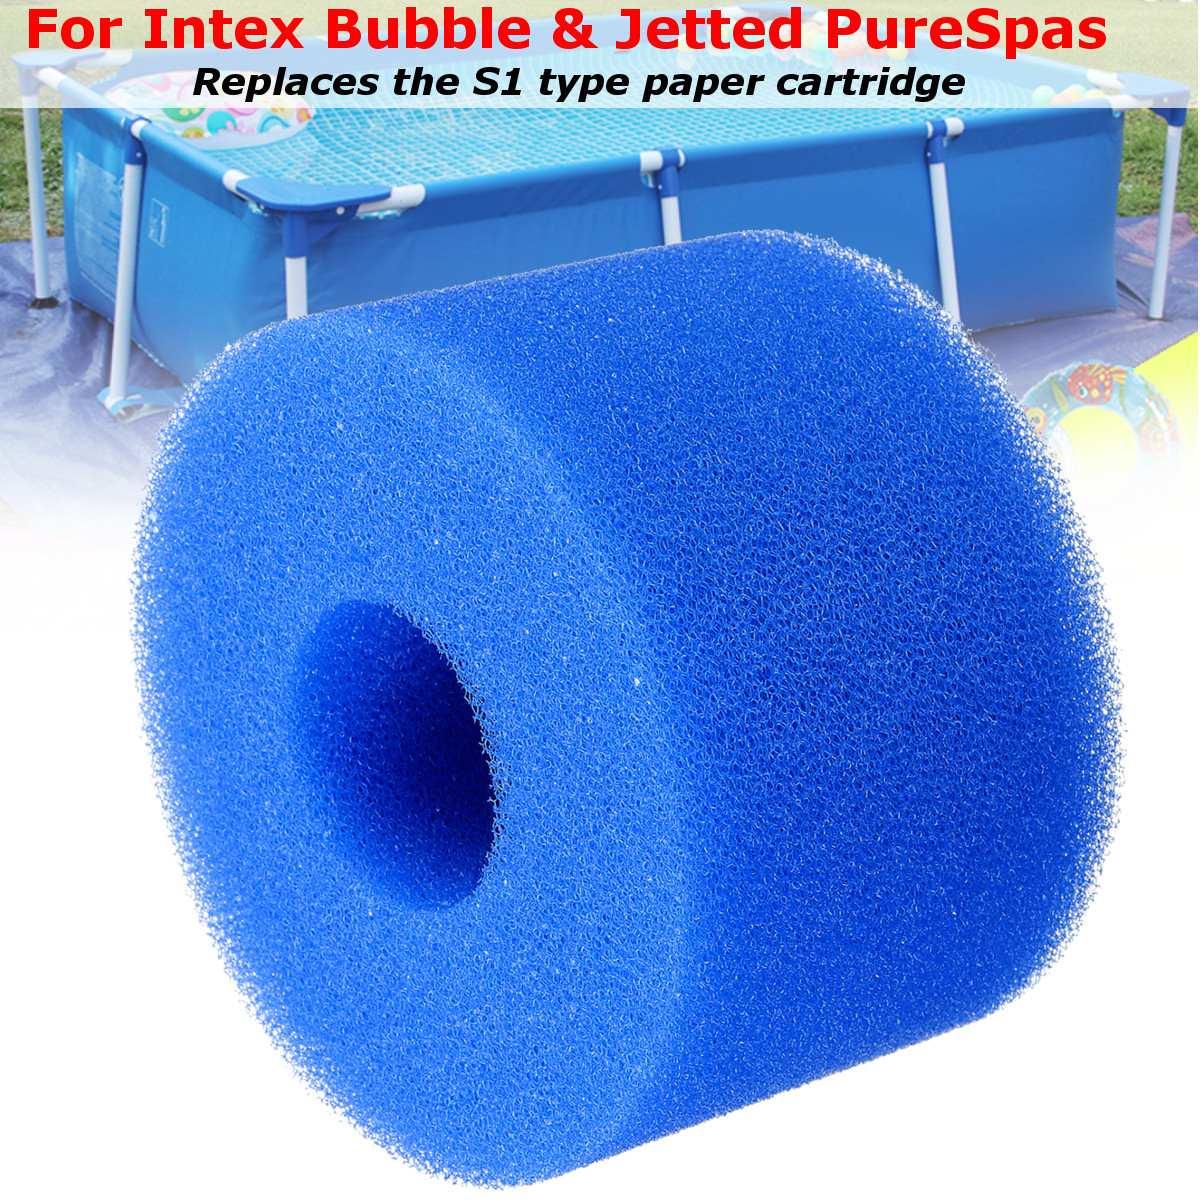 Changer Filtre Jacuzzi Intex | Enredada avec Cartouche Filtre Piscine Intex